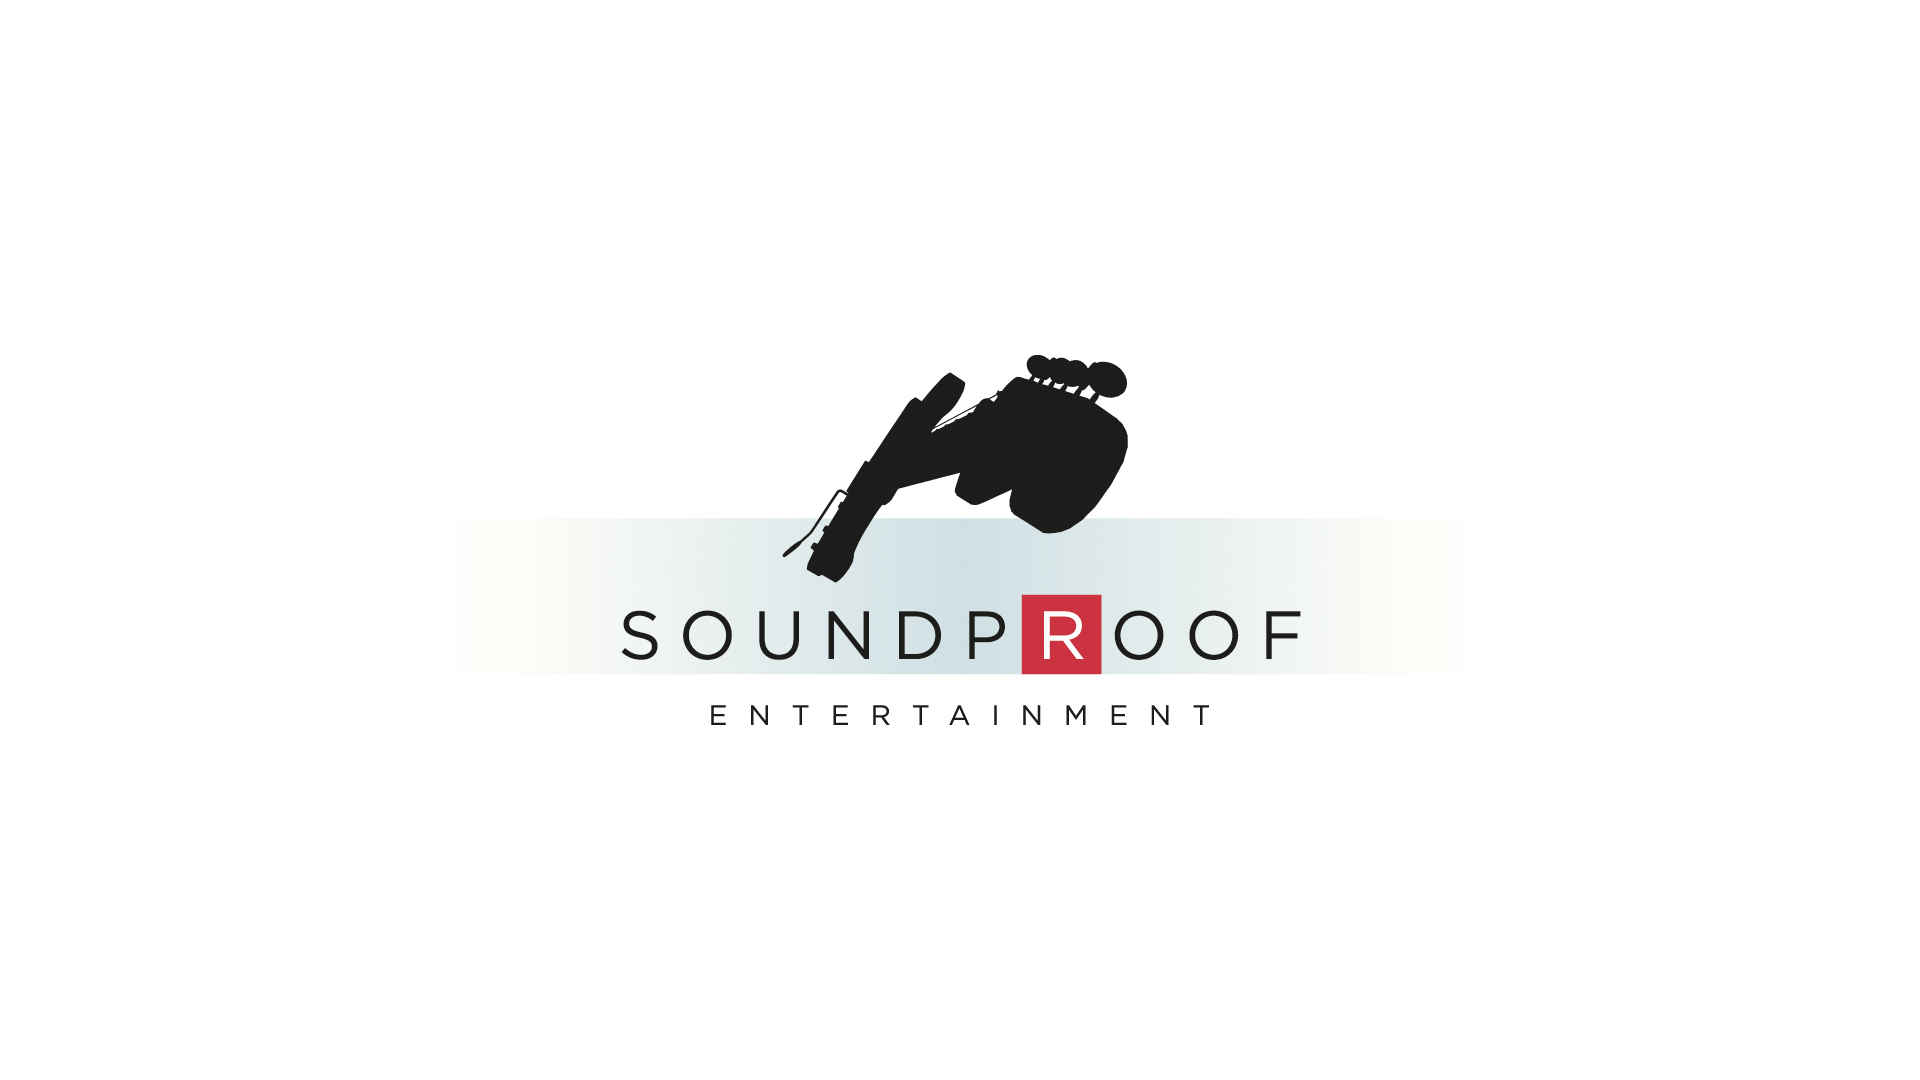 Soundproof Entertainment